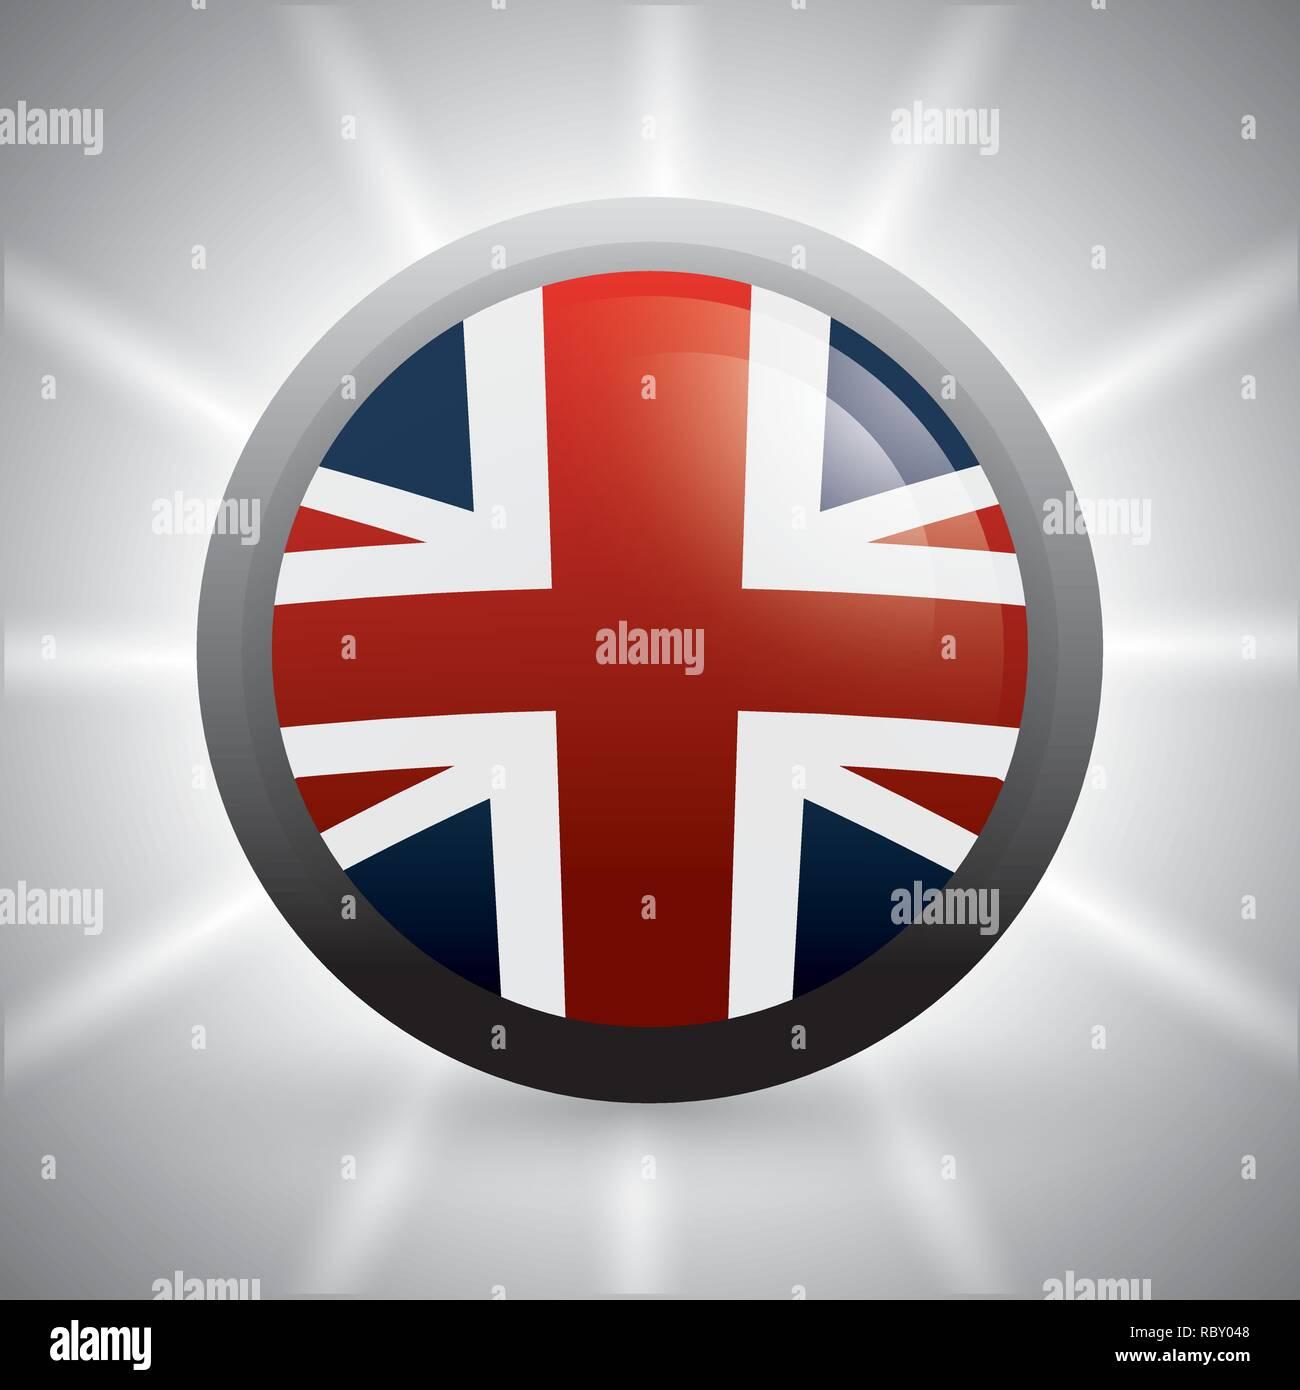 London landmarks design  - Stock Image